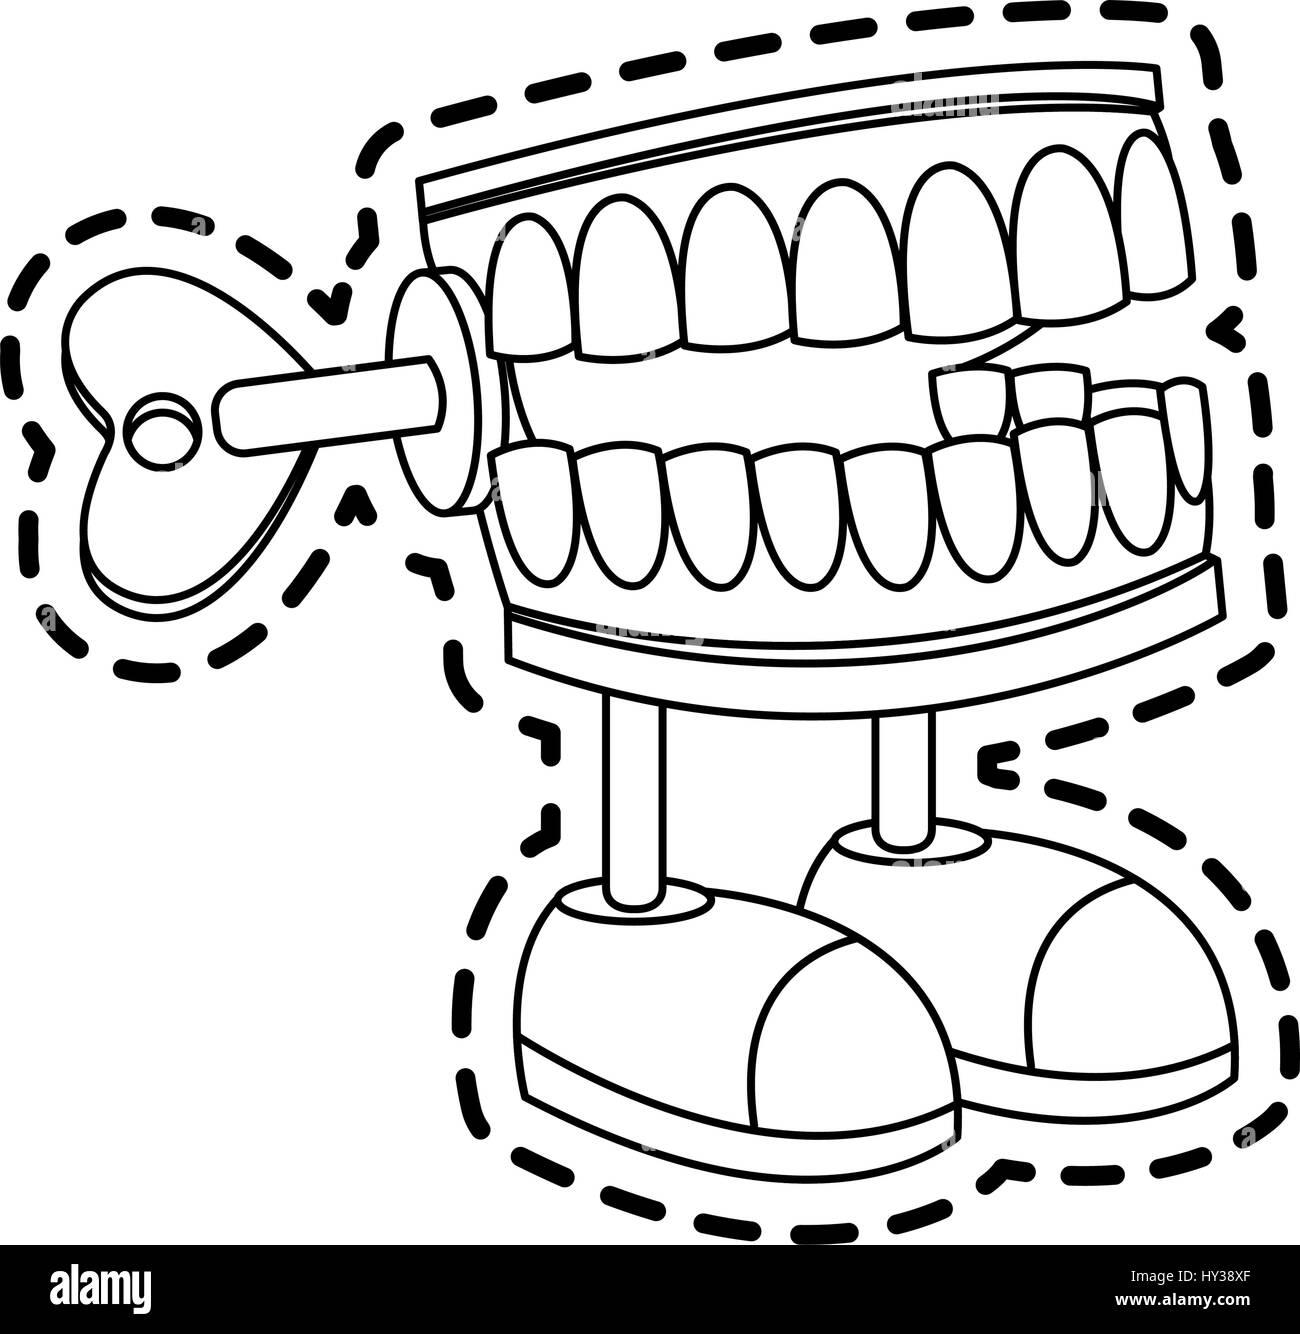 Free False Teeth Cliparts, Download Free Clip Art, Free Clip Art on Clipart  Library